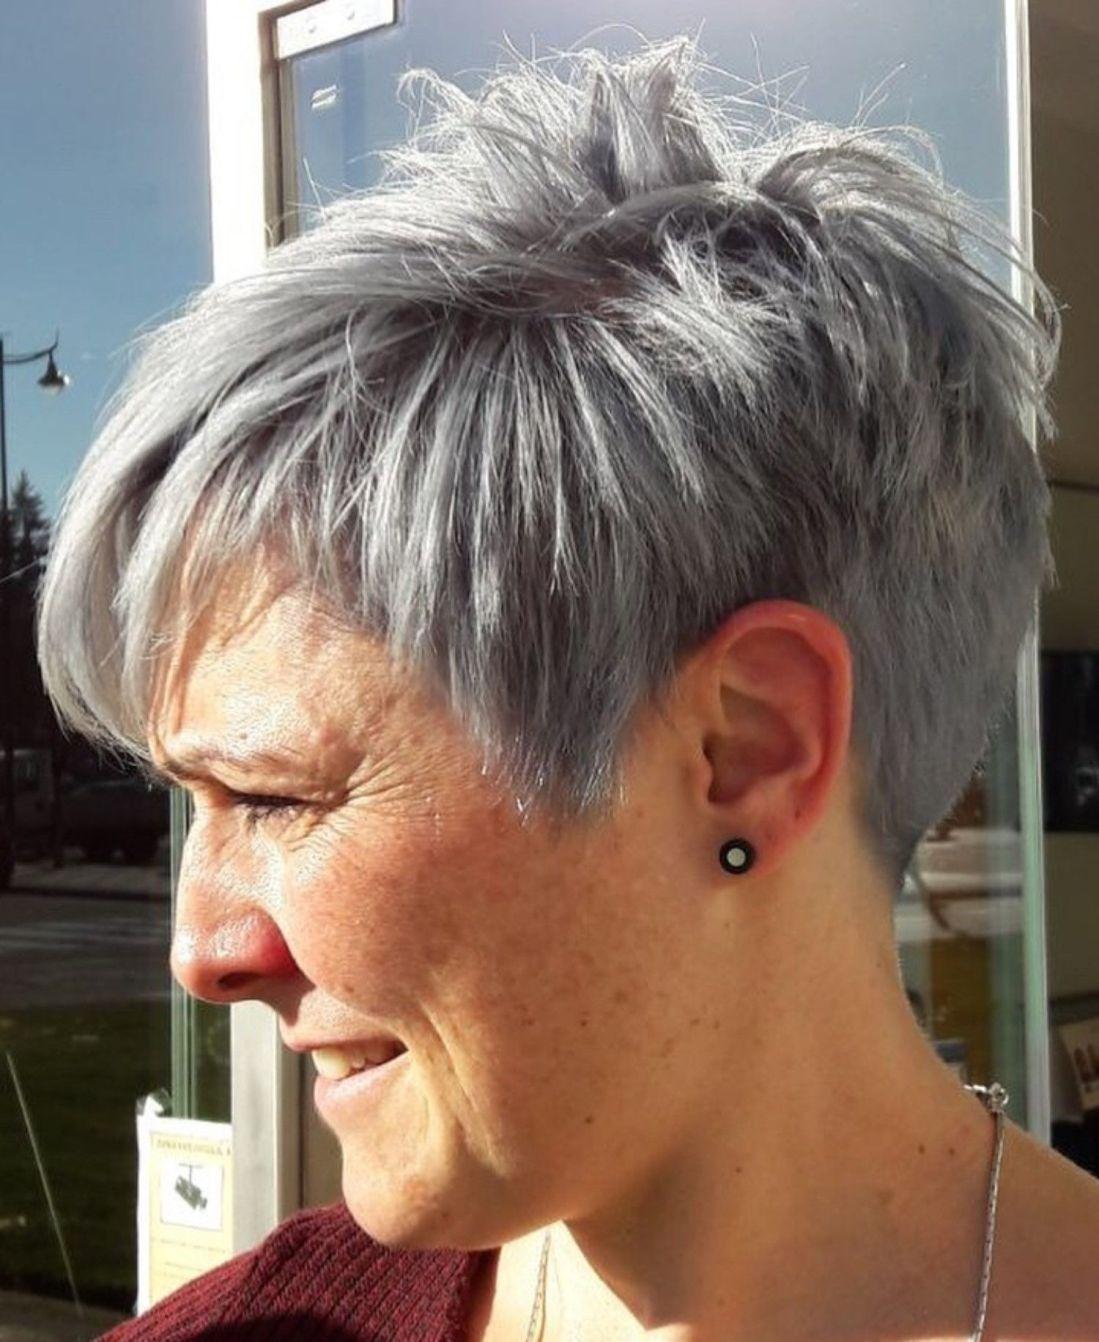 200 Ideeen Over Korte Dames Kapsels Kapsels Kort Haar Kapsels Kort Haar